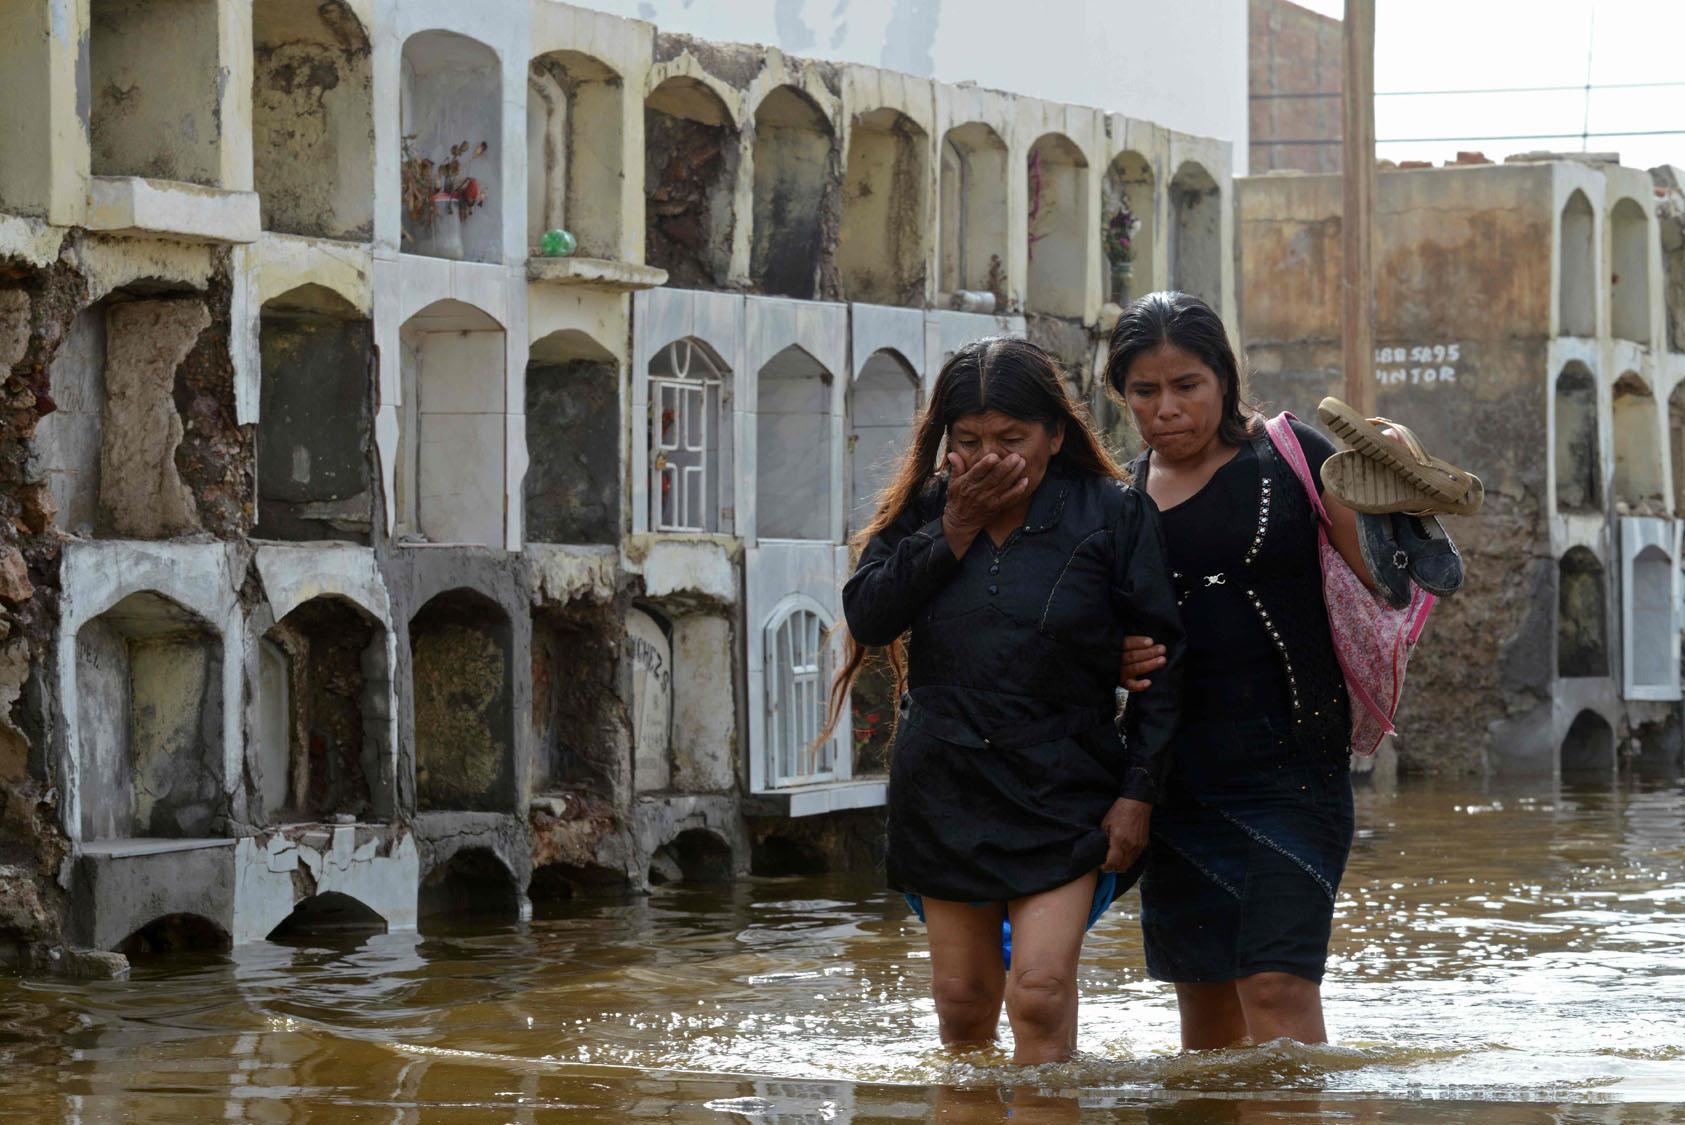 Flooding, landslides strike Peru